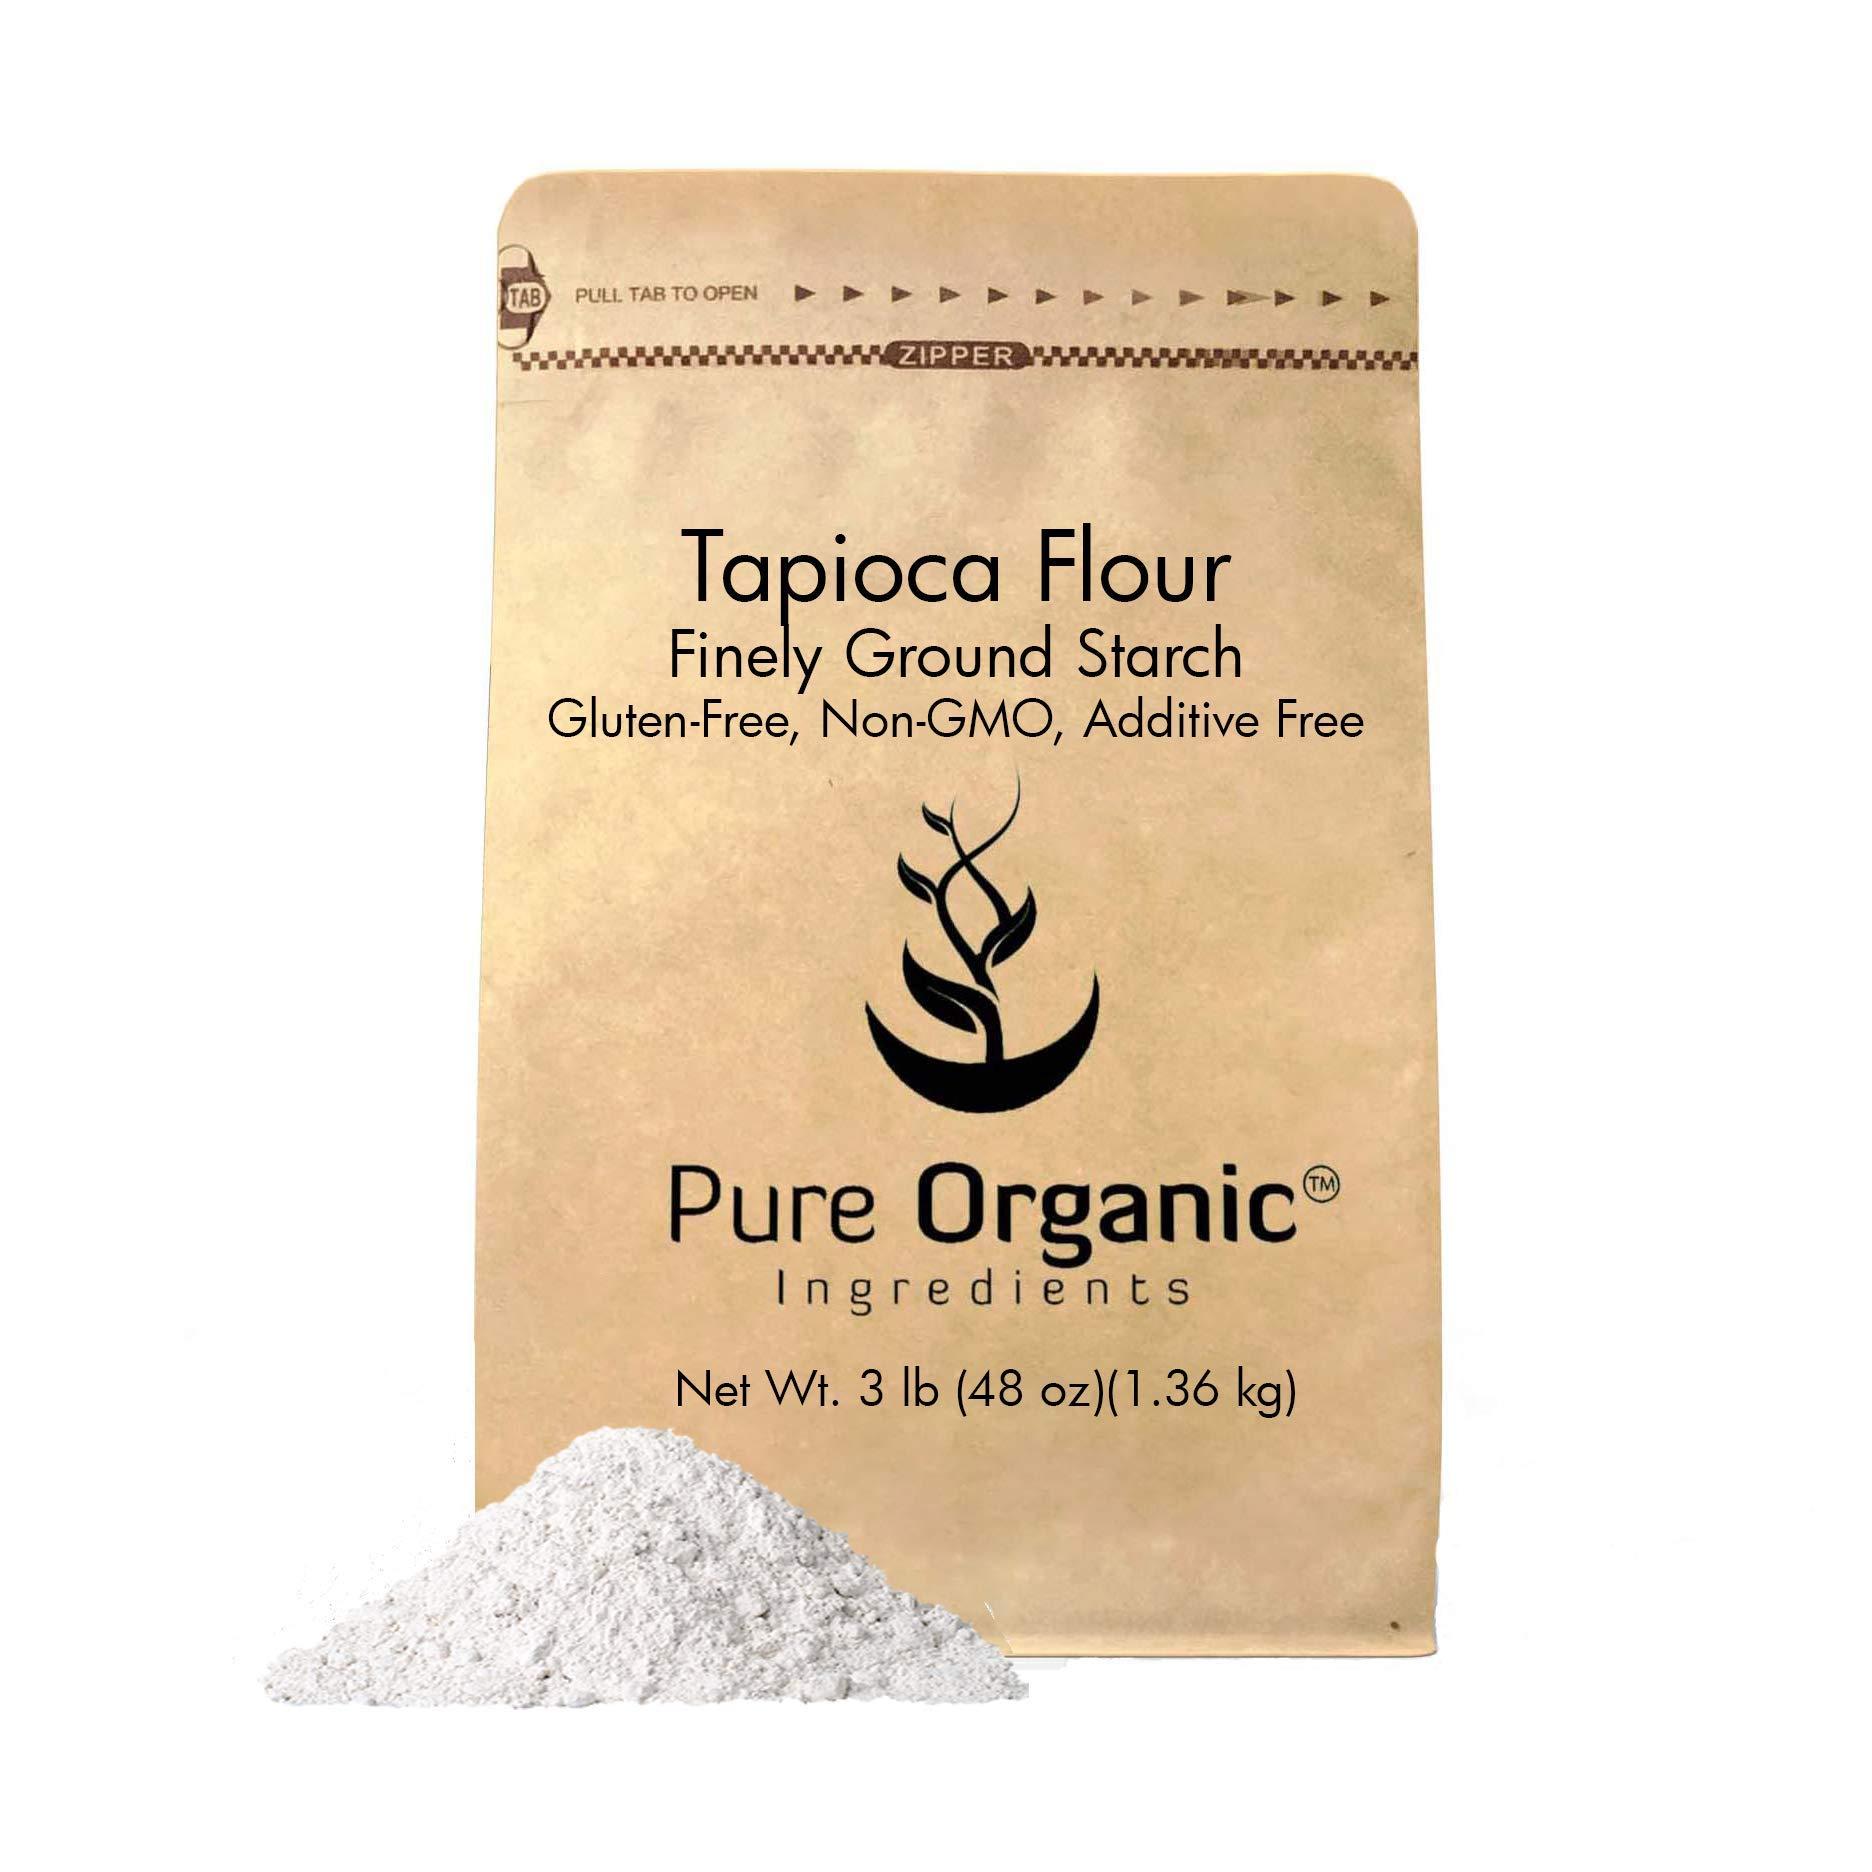 Pure Organic Ingredients Tapioca Flour, 3 lb. (48 oz.), Resealable Eco-Friendly Packaging, Also Called Tapioca Starch, Fine White Powder, Gluten-Free, Non-GMO